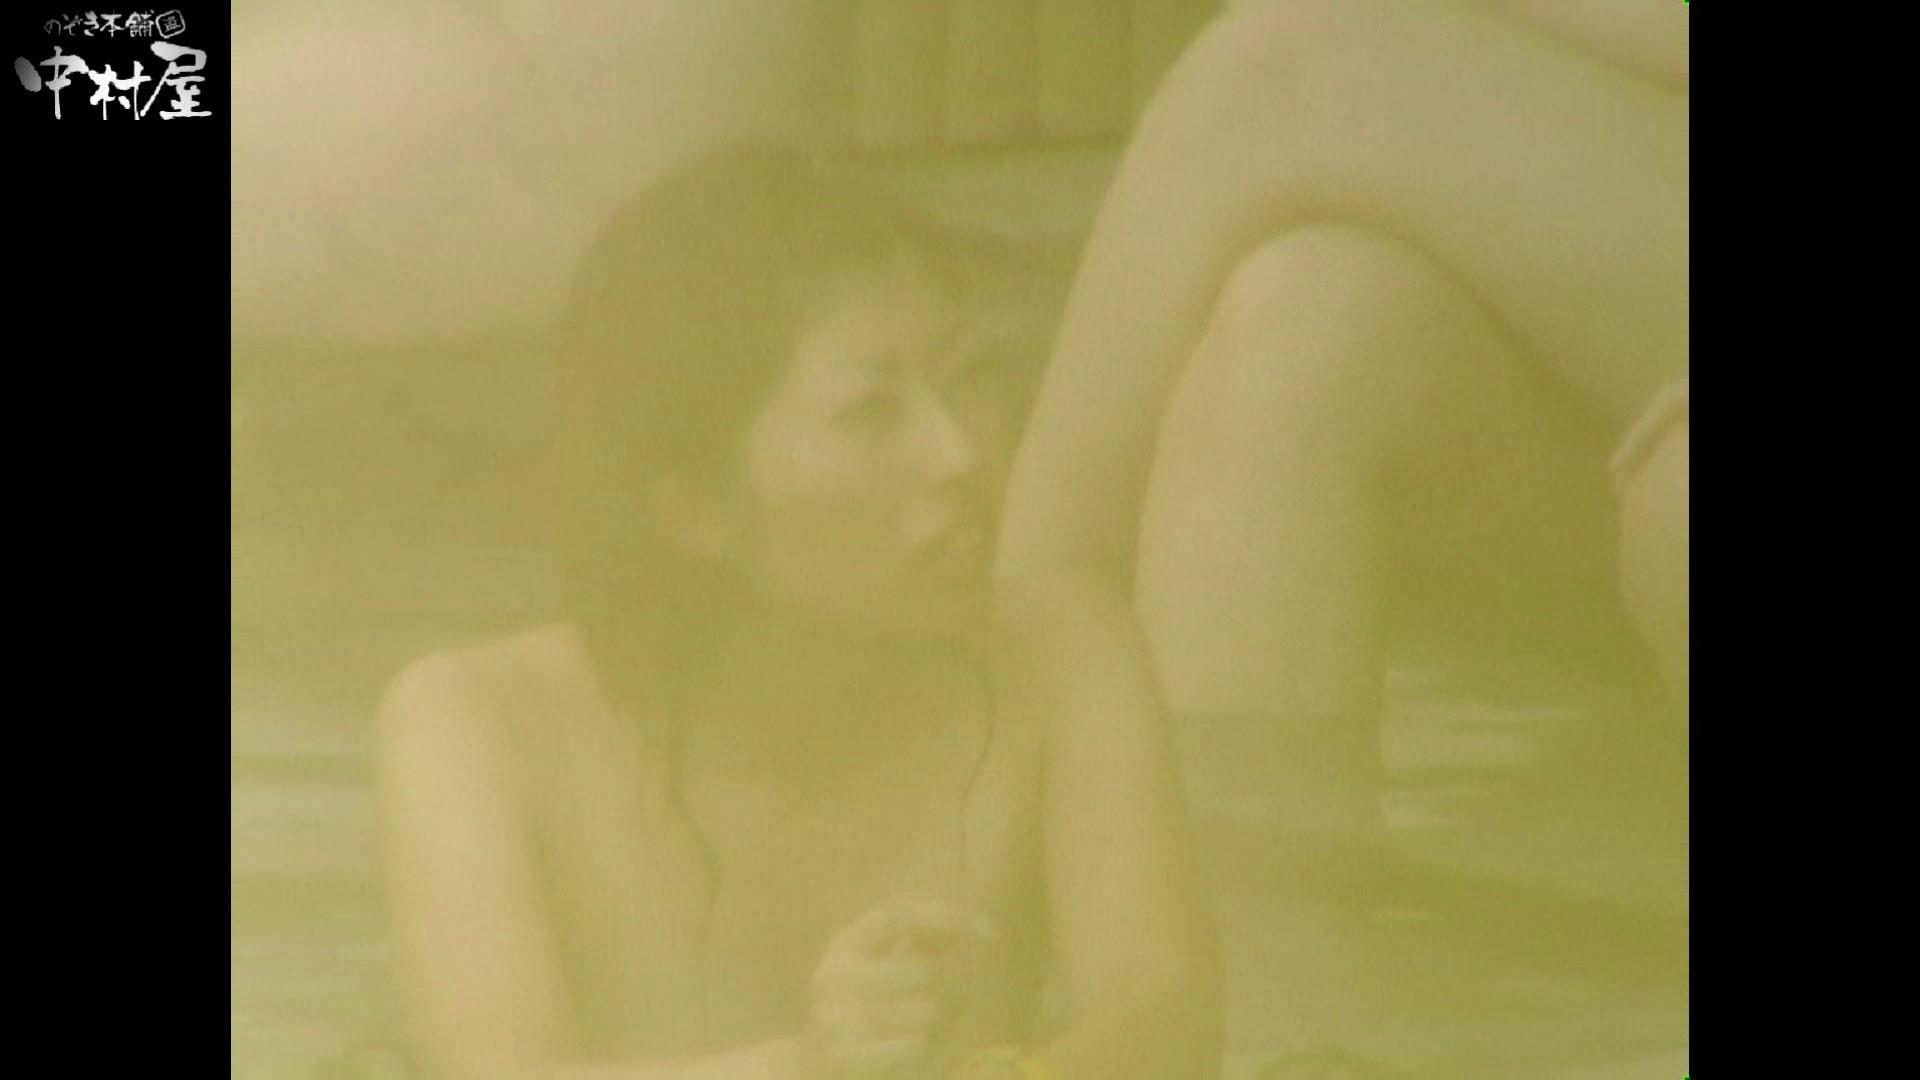 Aquaな露天風呂Vol.940 OLセックス  98画像 36